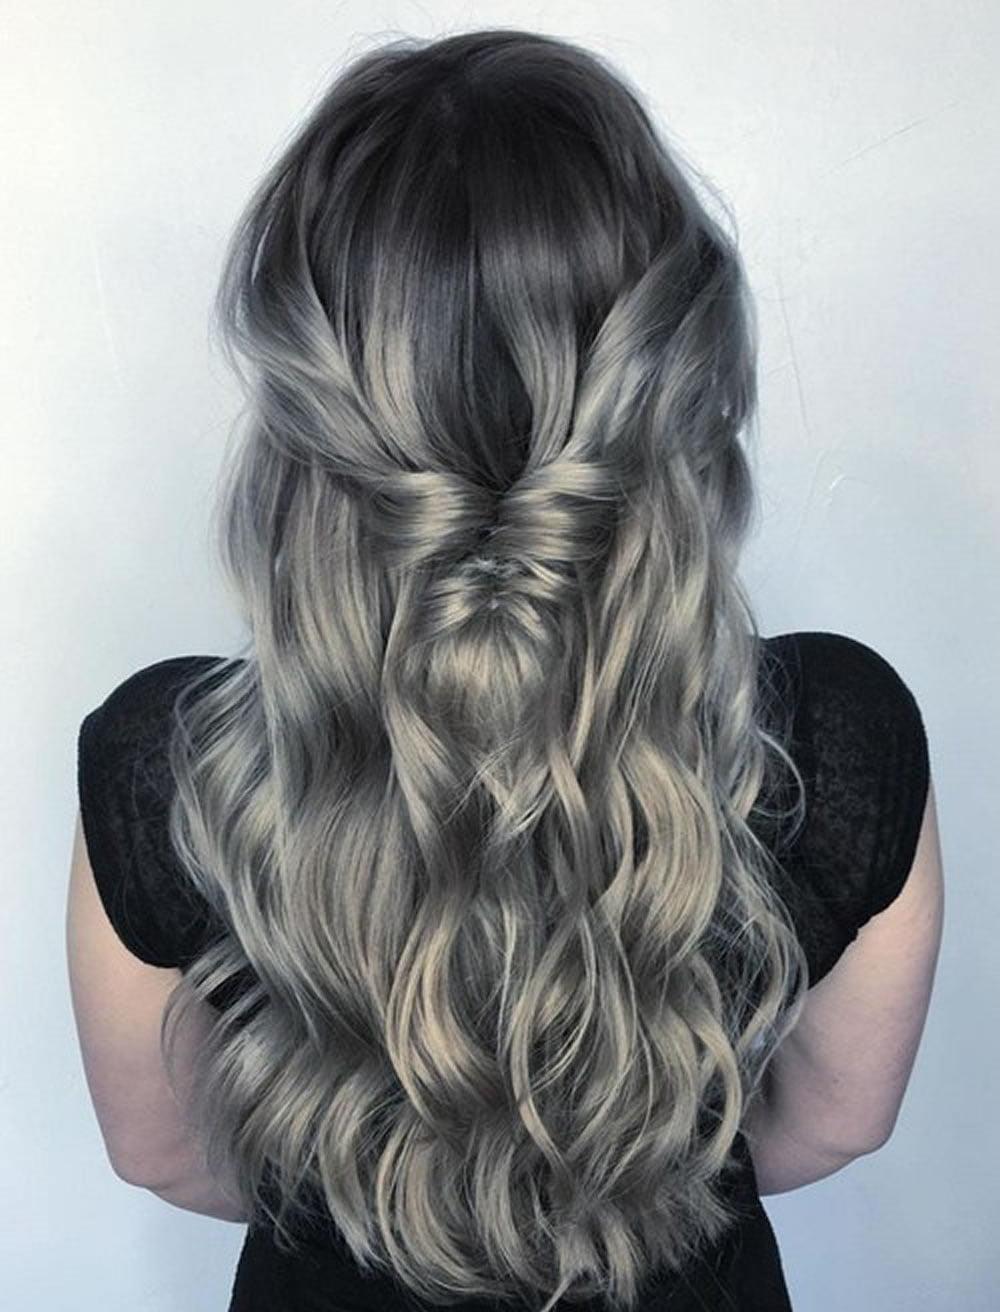 Grey Hair Trend – 20 Glamorous Hairstyles for Women 2020 ...